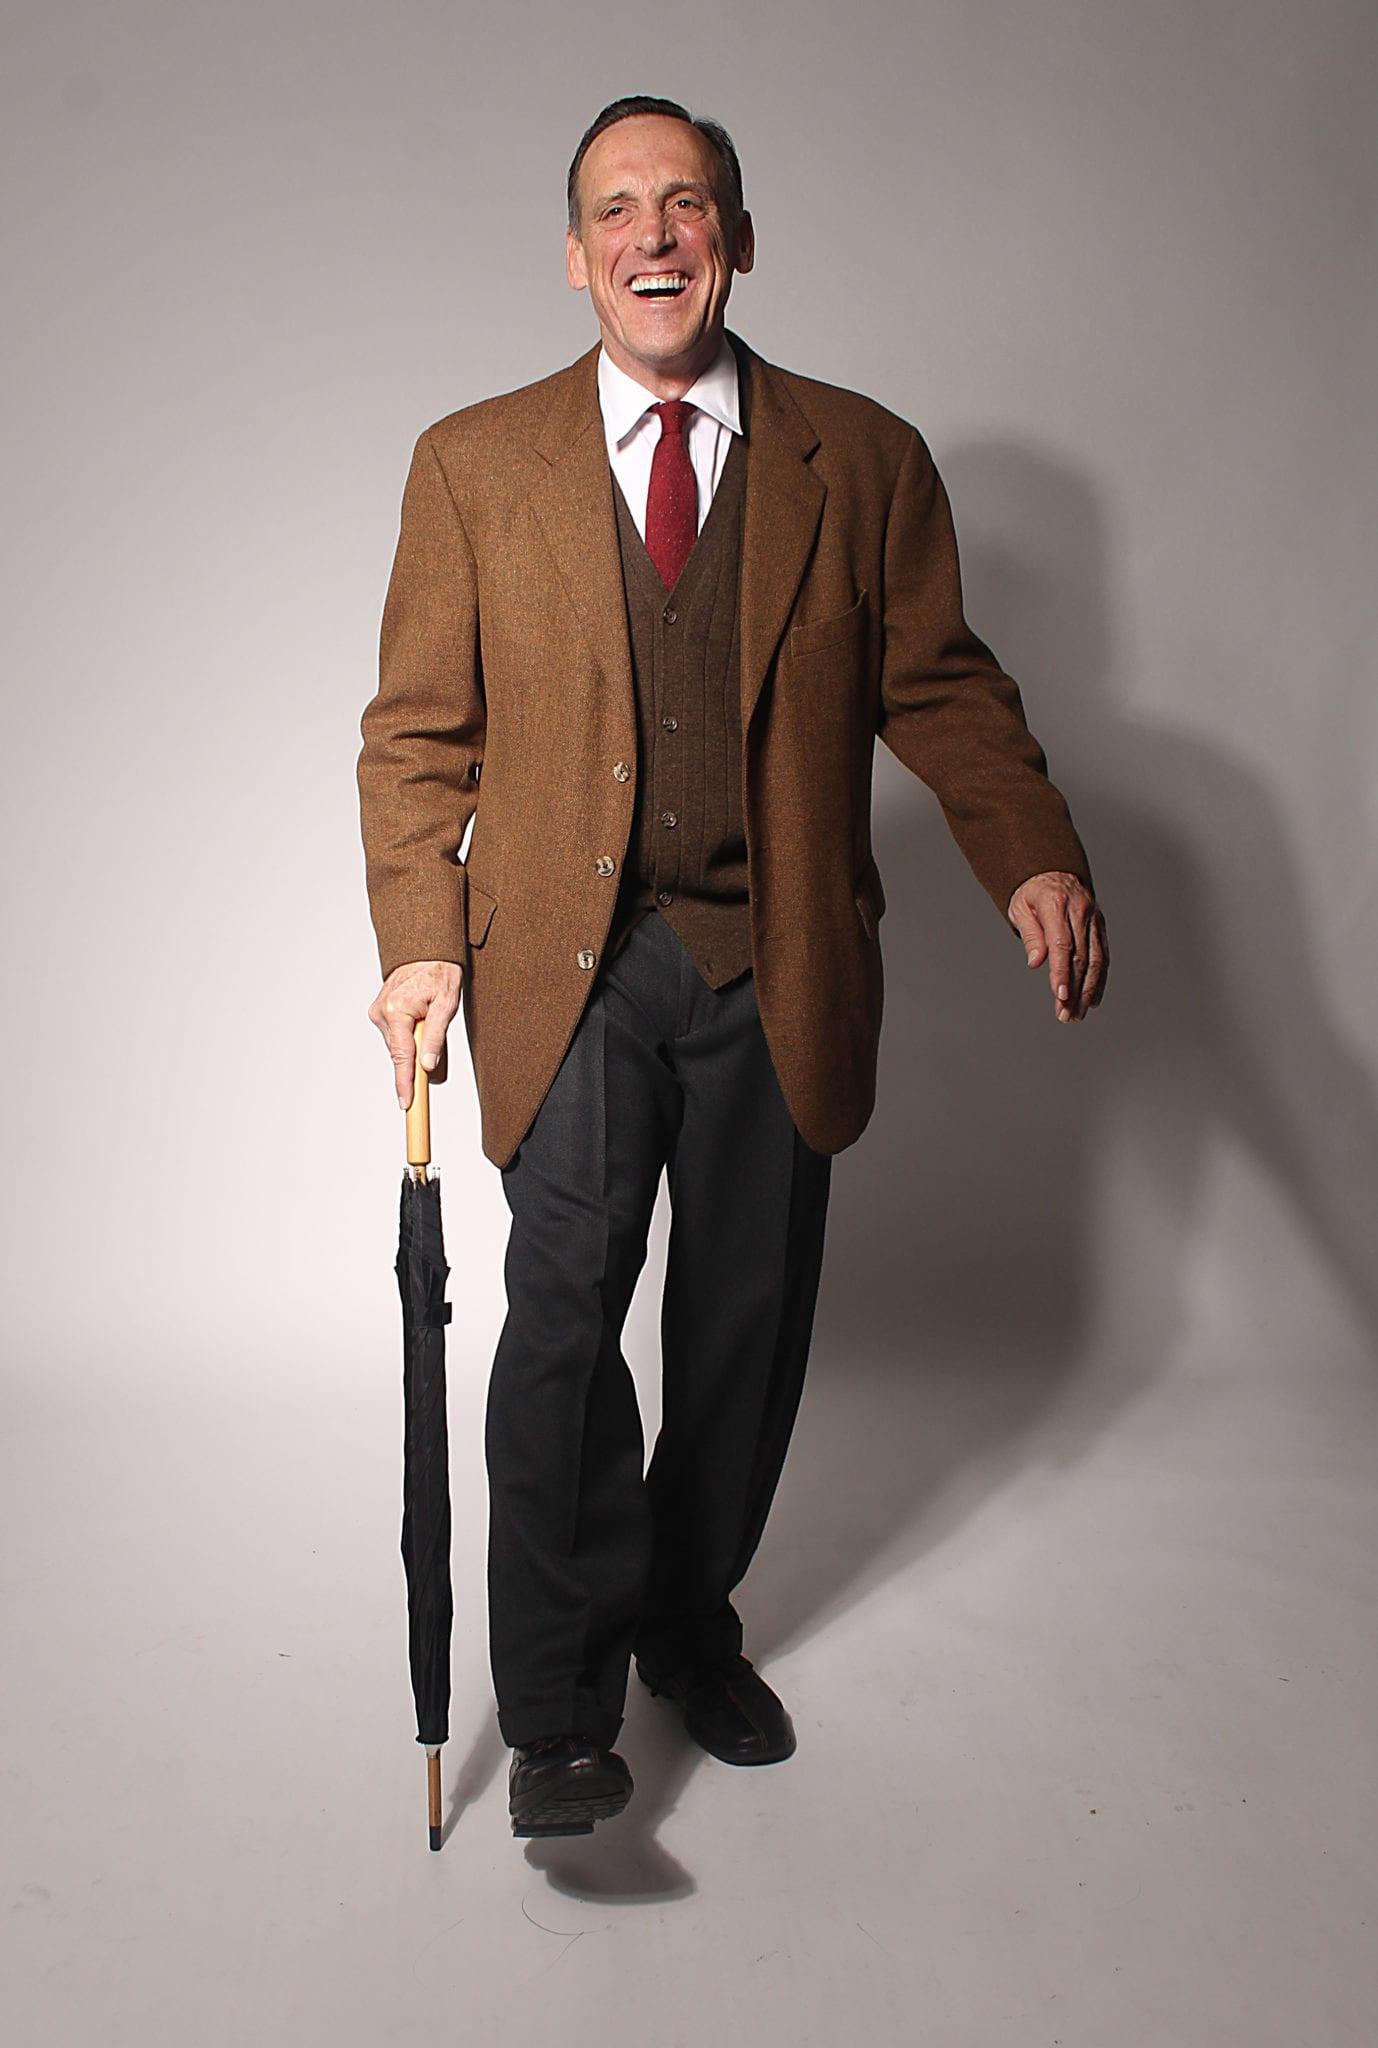 Tom Key as C. S. Lewis. Photo by BreeAnne Clowdus.